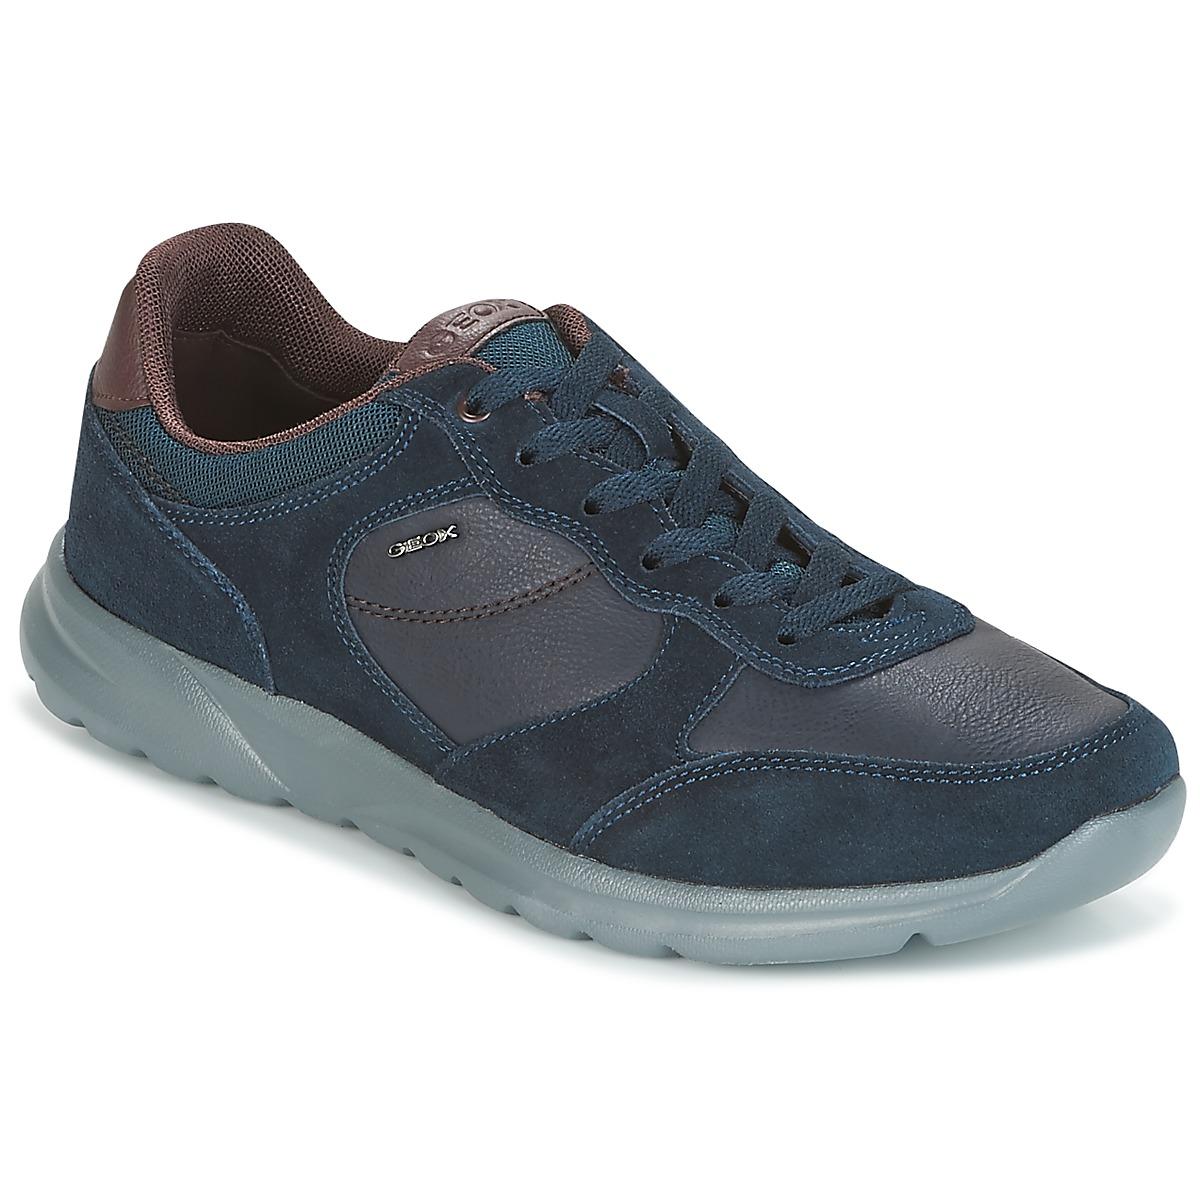 Geox U DAMIAN Blau - Kostenloser Versand bei Spartoode ! - Schuhe Sneaker Low Herren 71,99 €